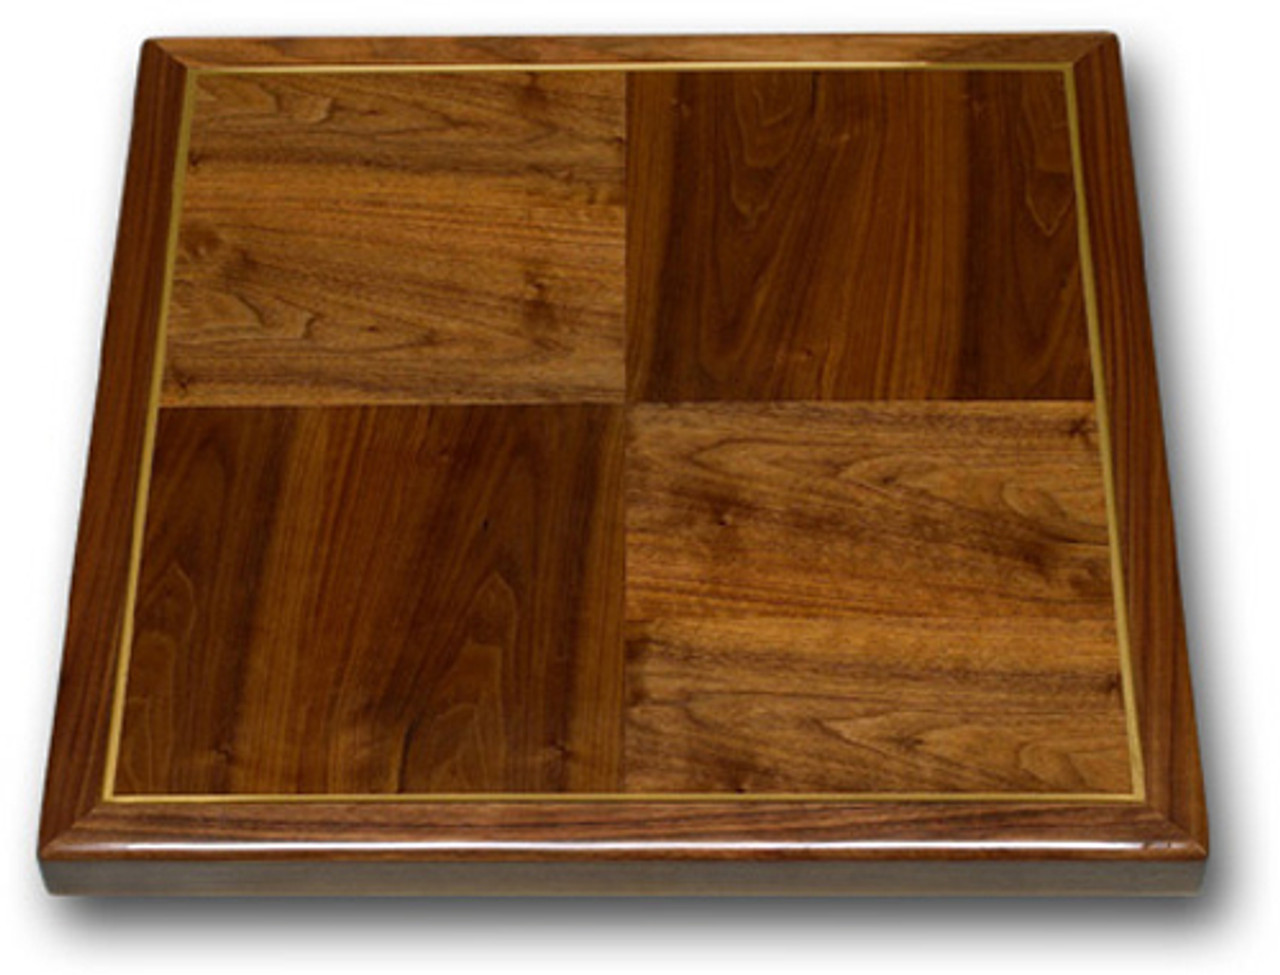 Hoffmann-MOBIL-Press-Walnut-Parquet-table-top-sample